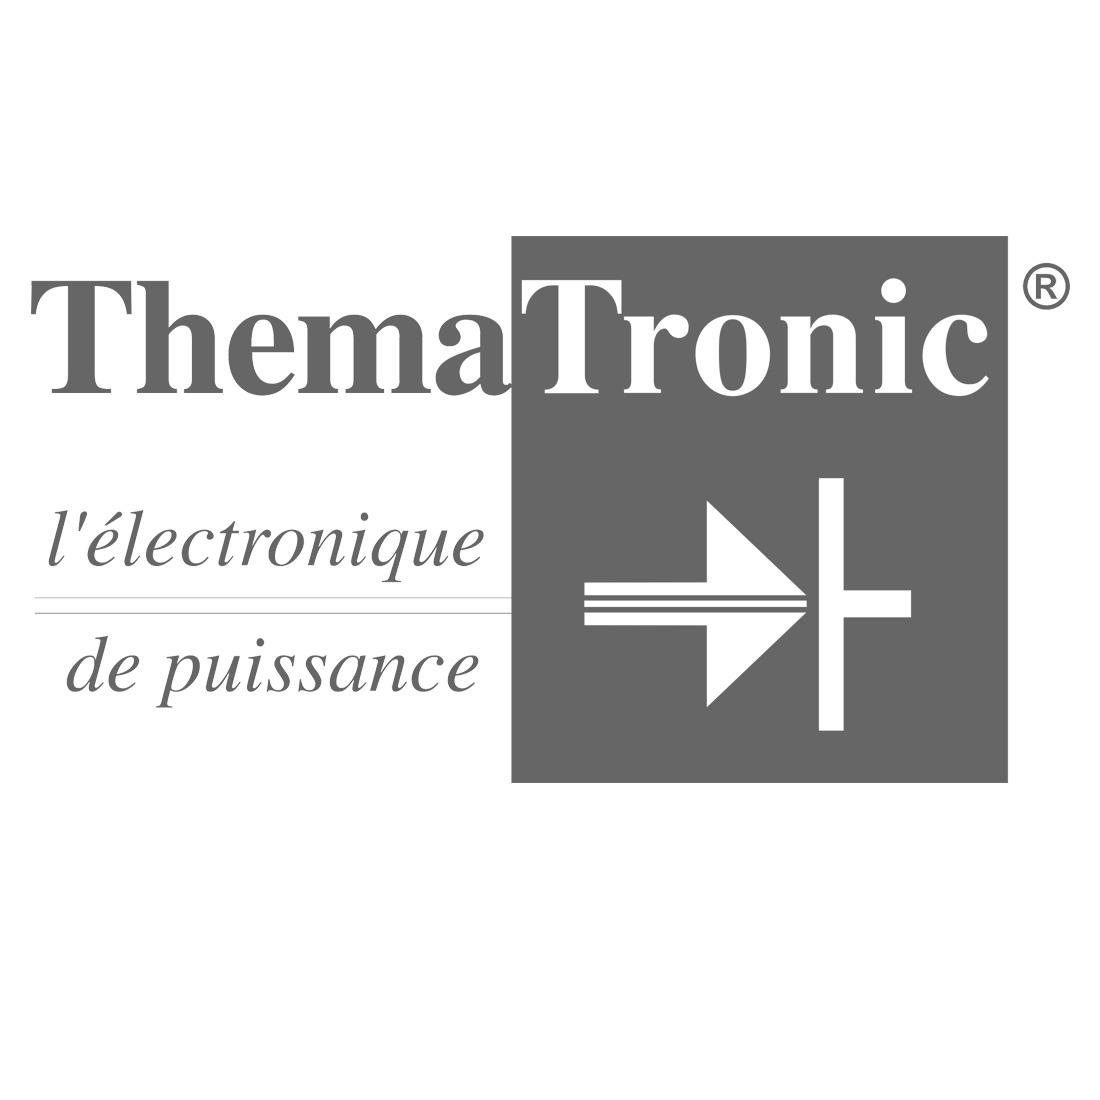 agence-comunication-lyon-thematronic